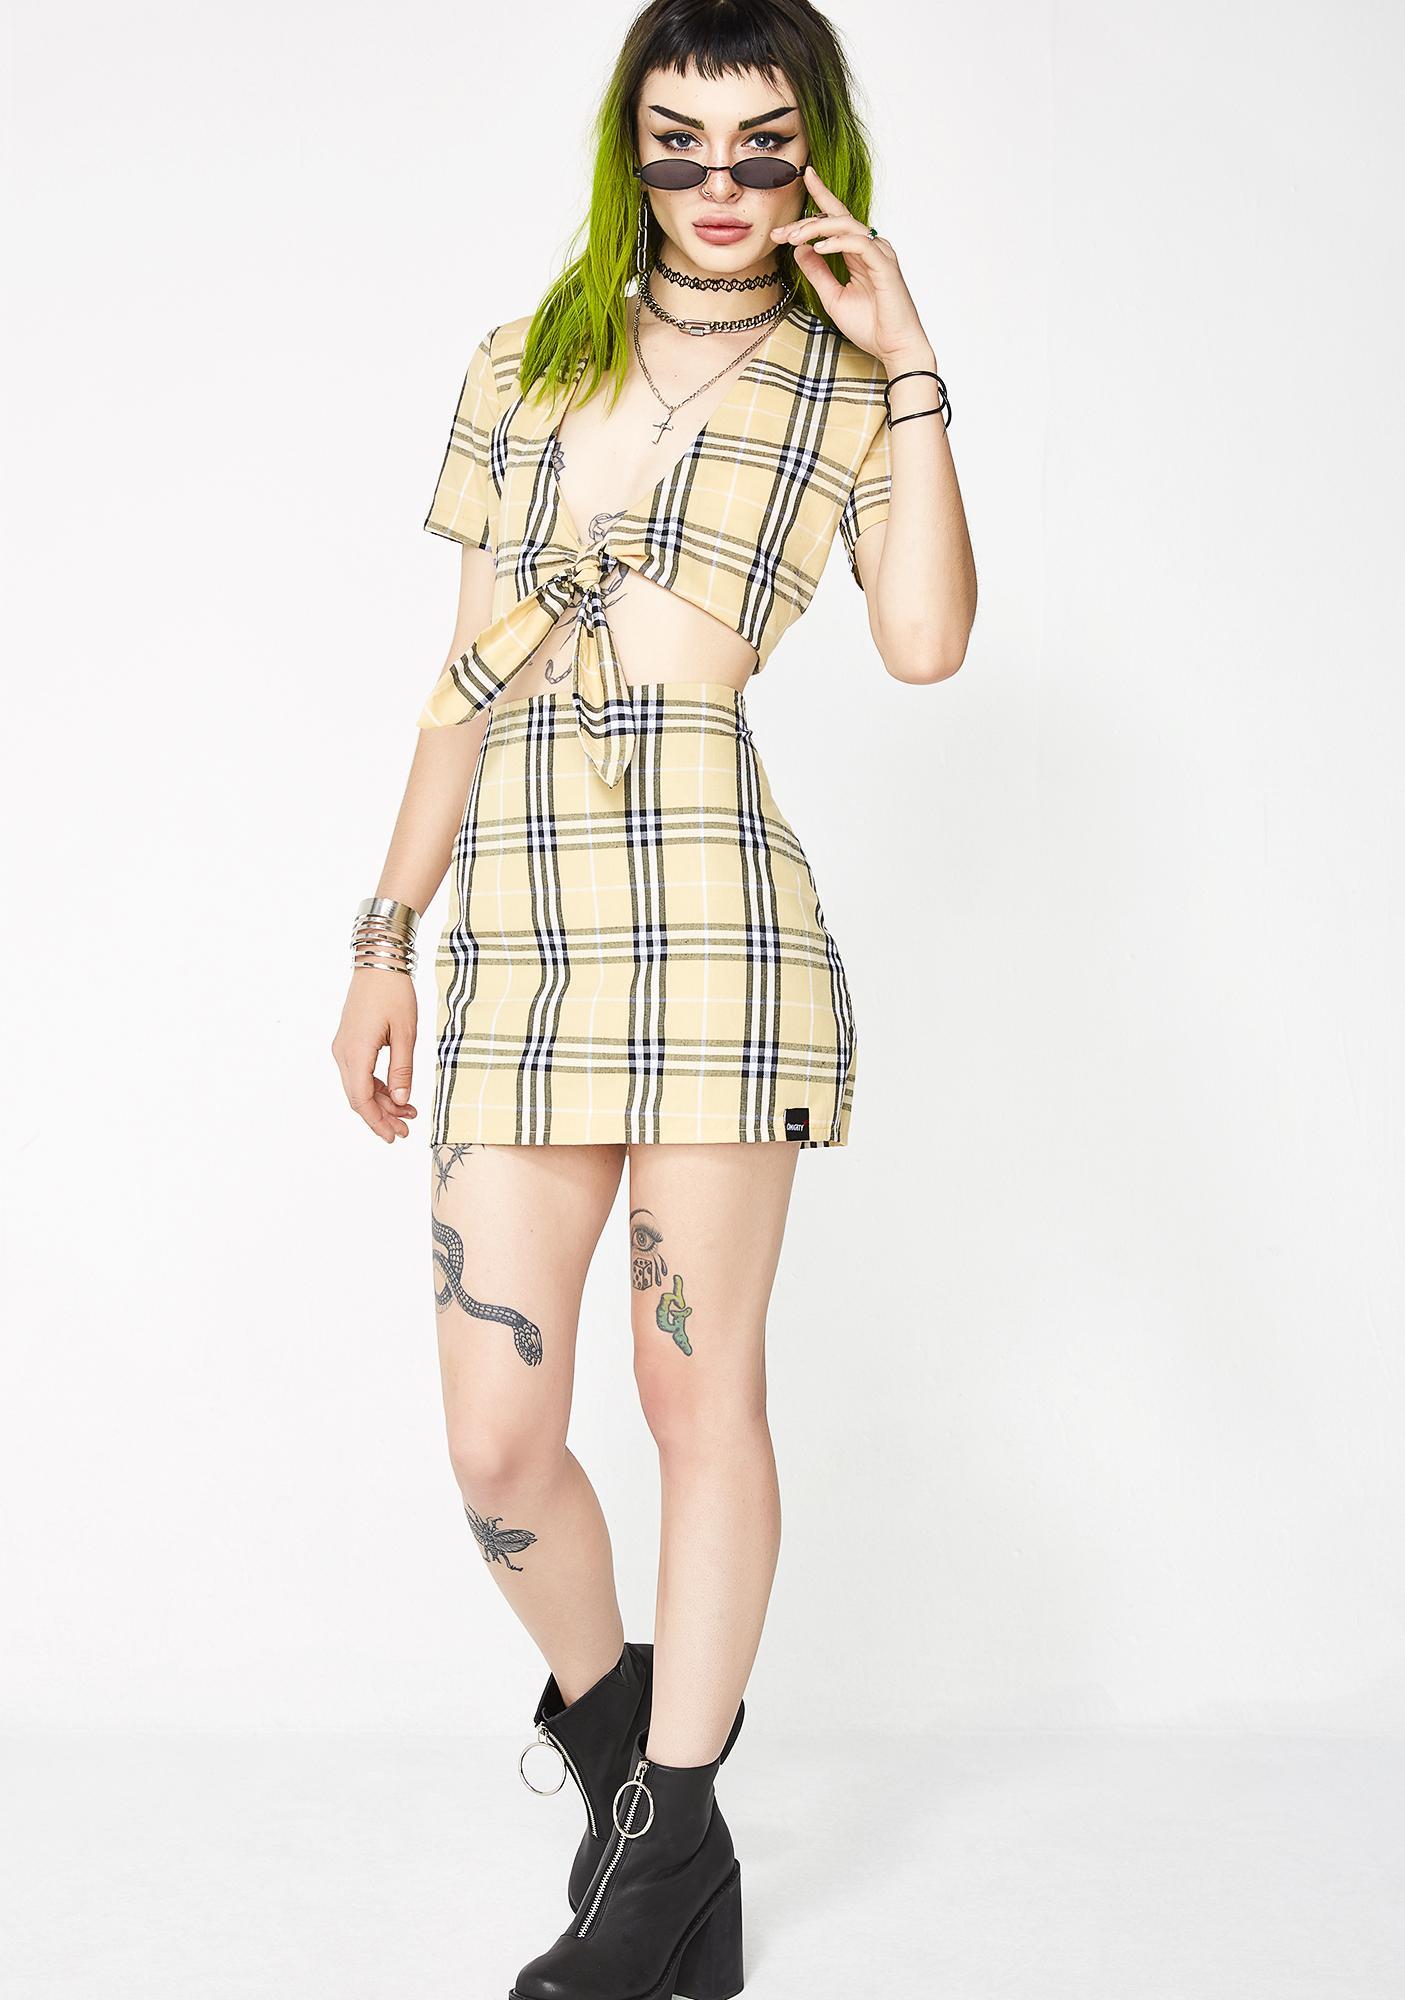 O Mighty Gwen Skirt